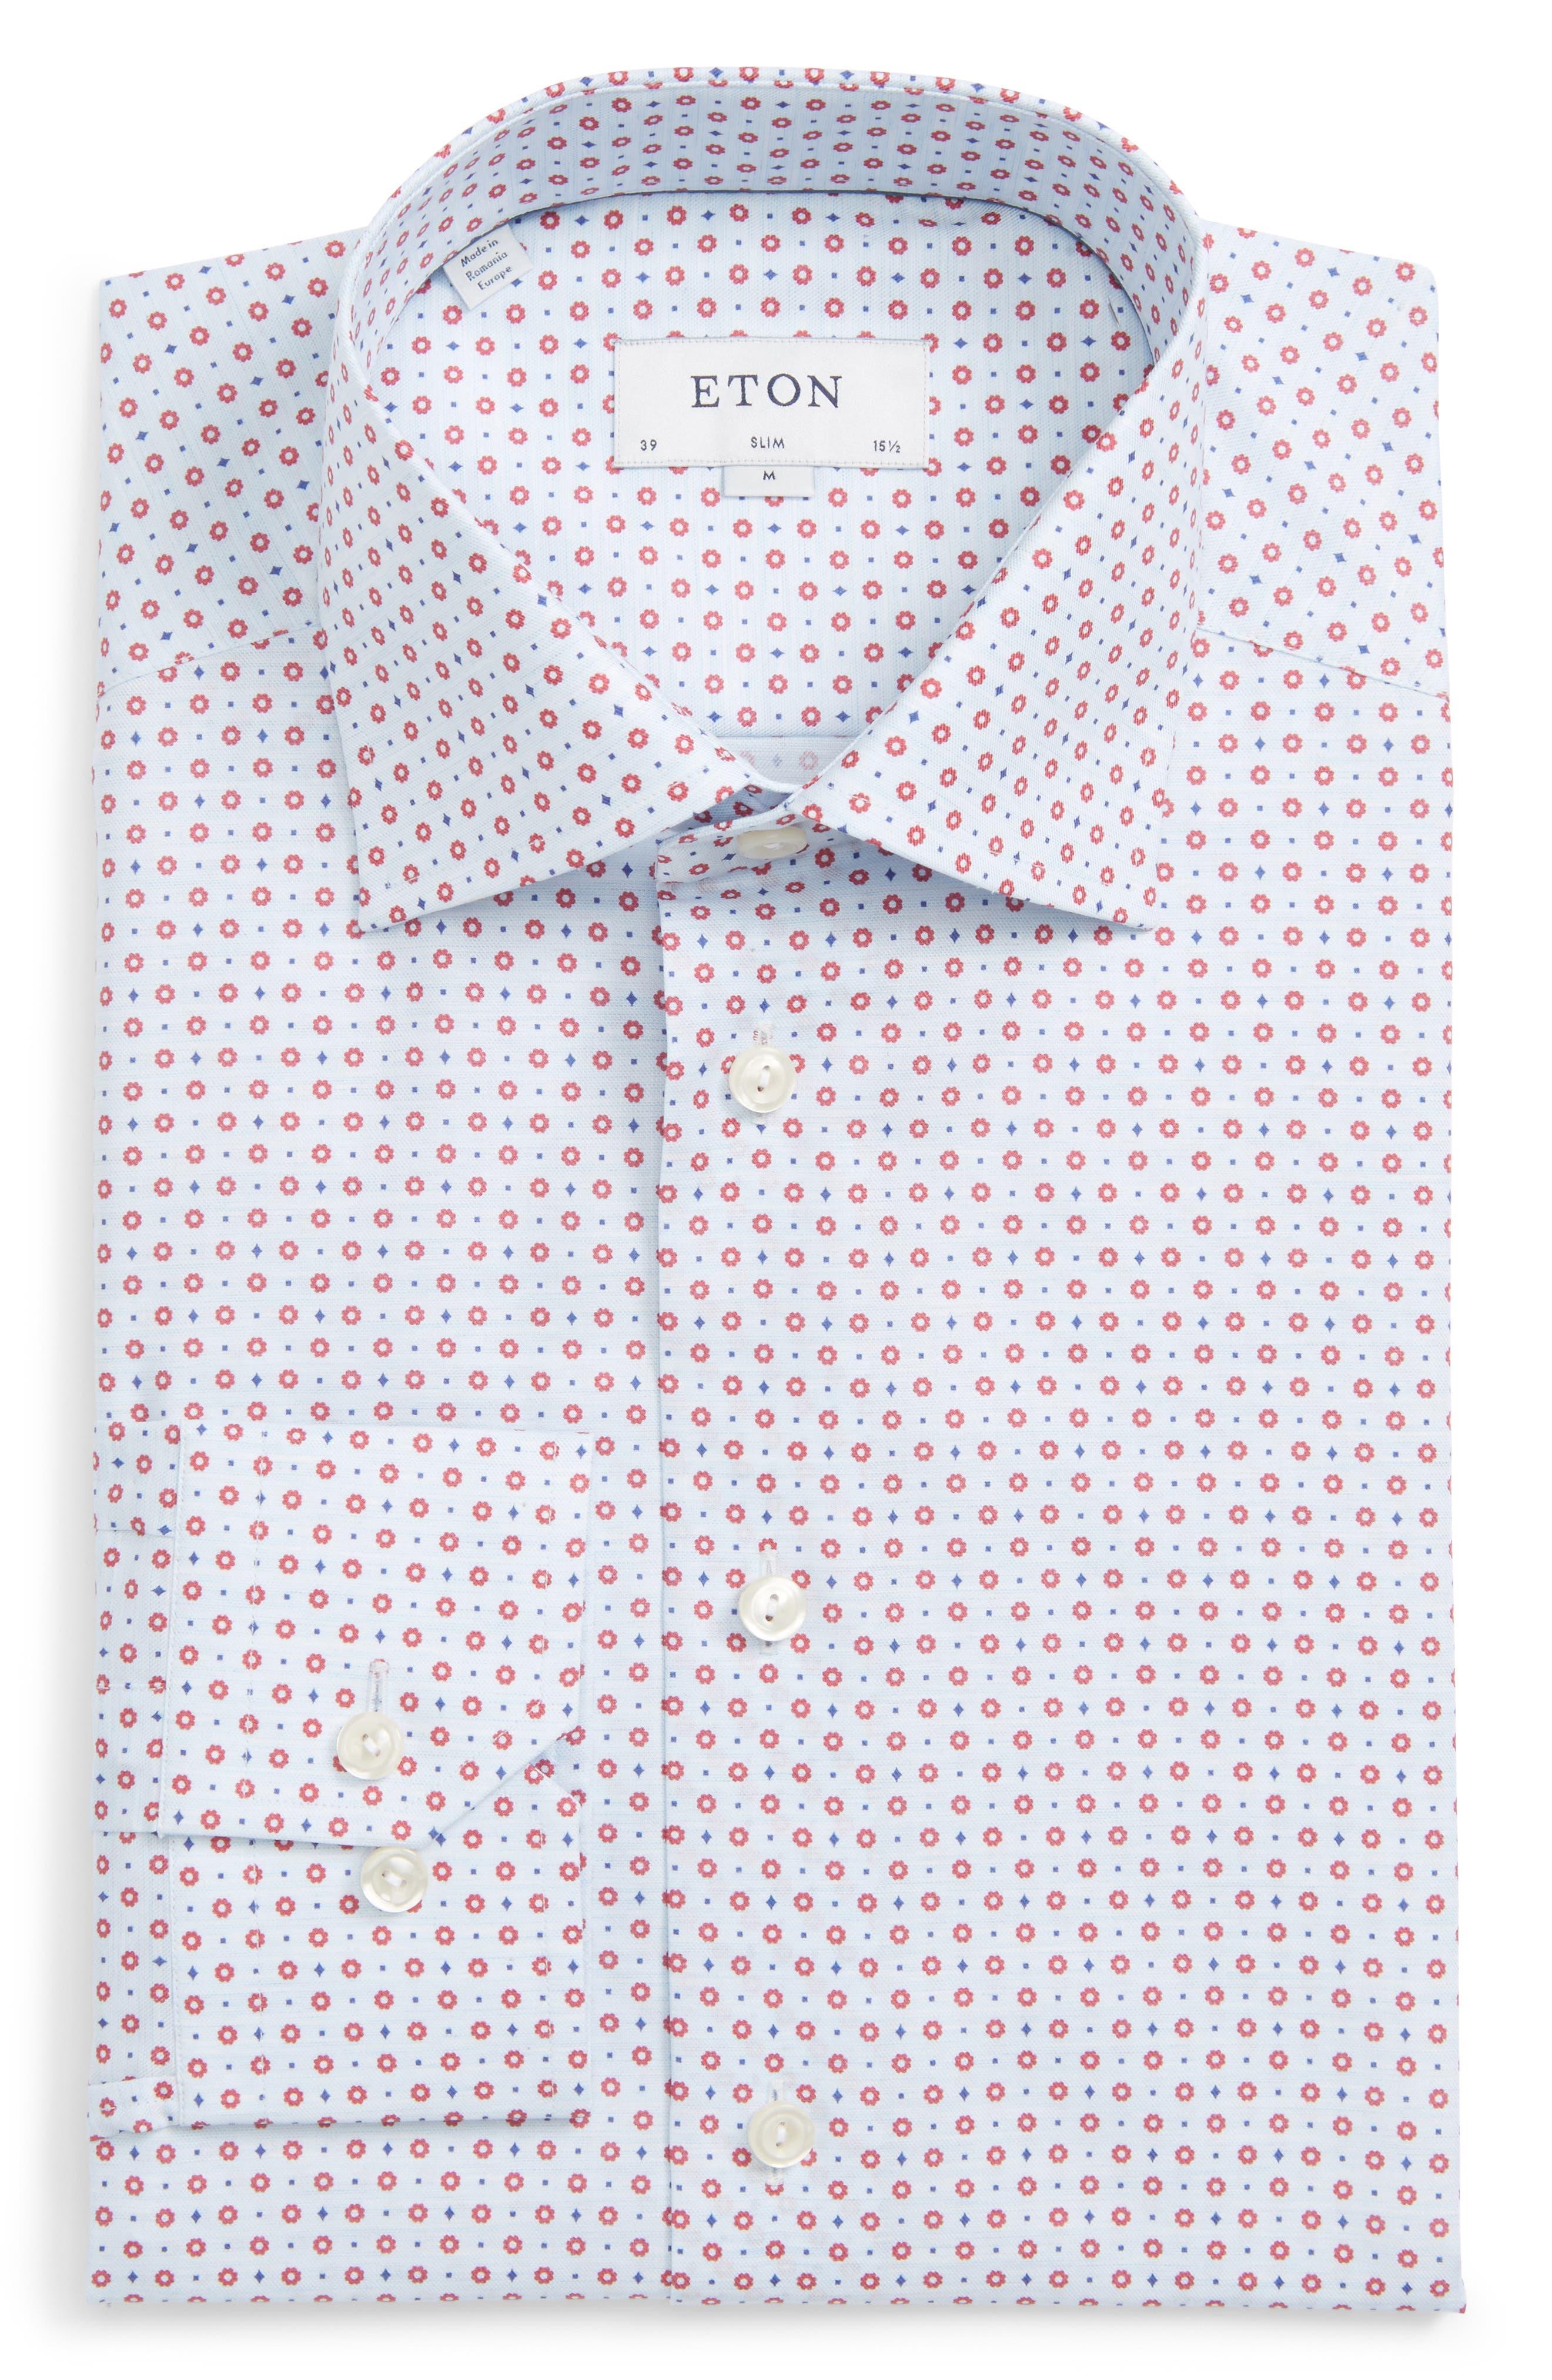 Eton Slim Fit Floral Print Dress Shirt